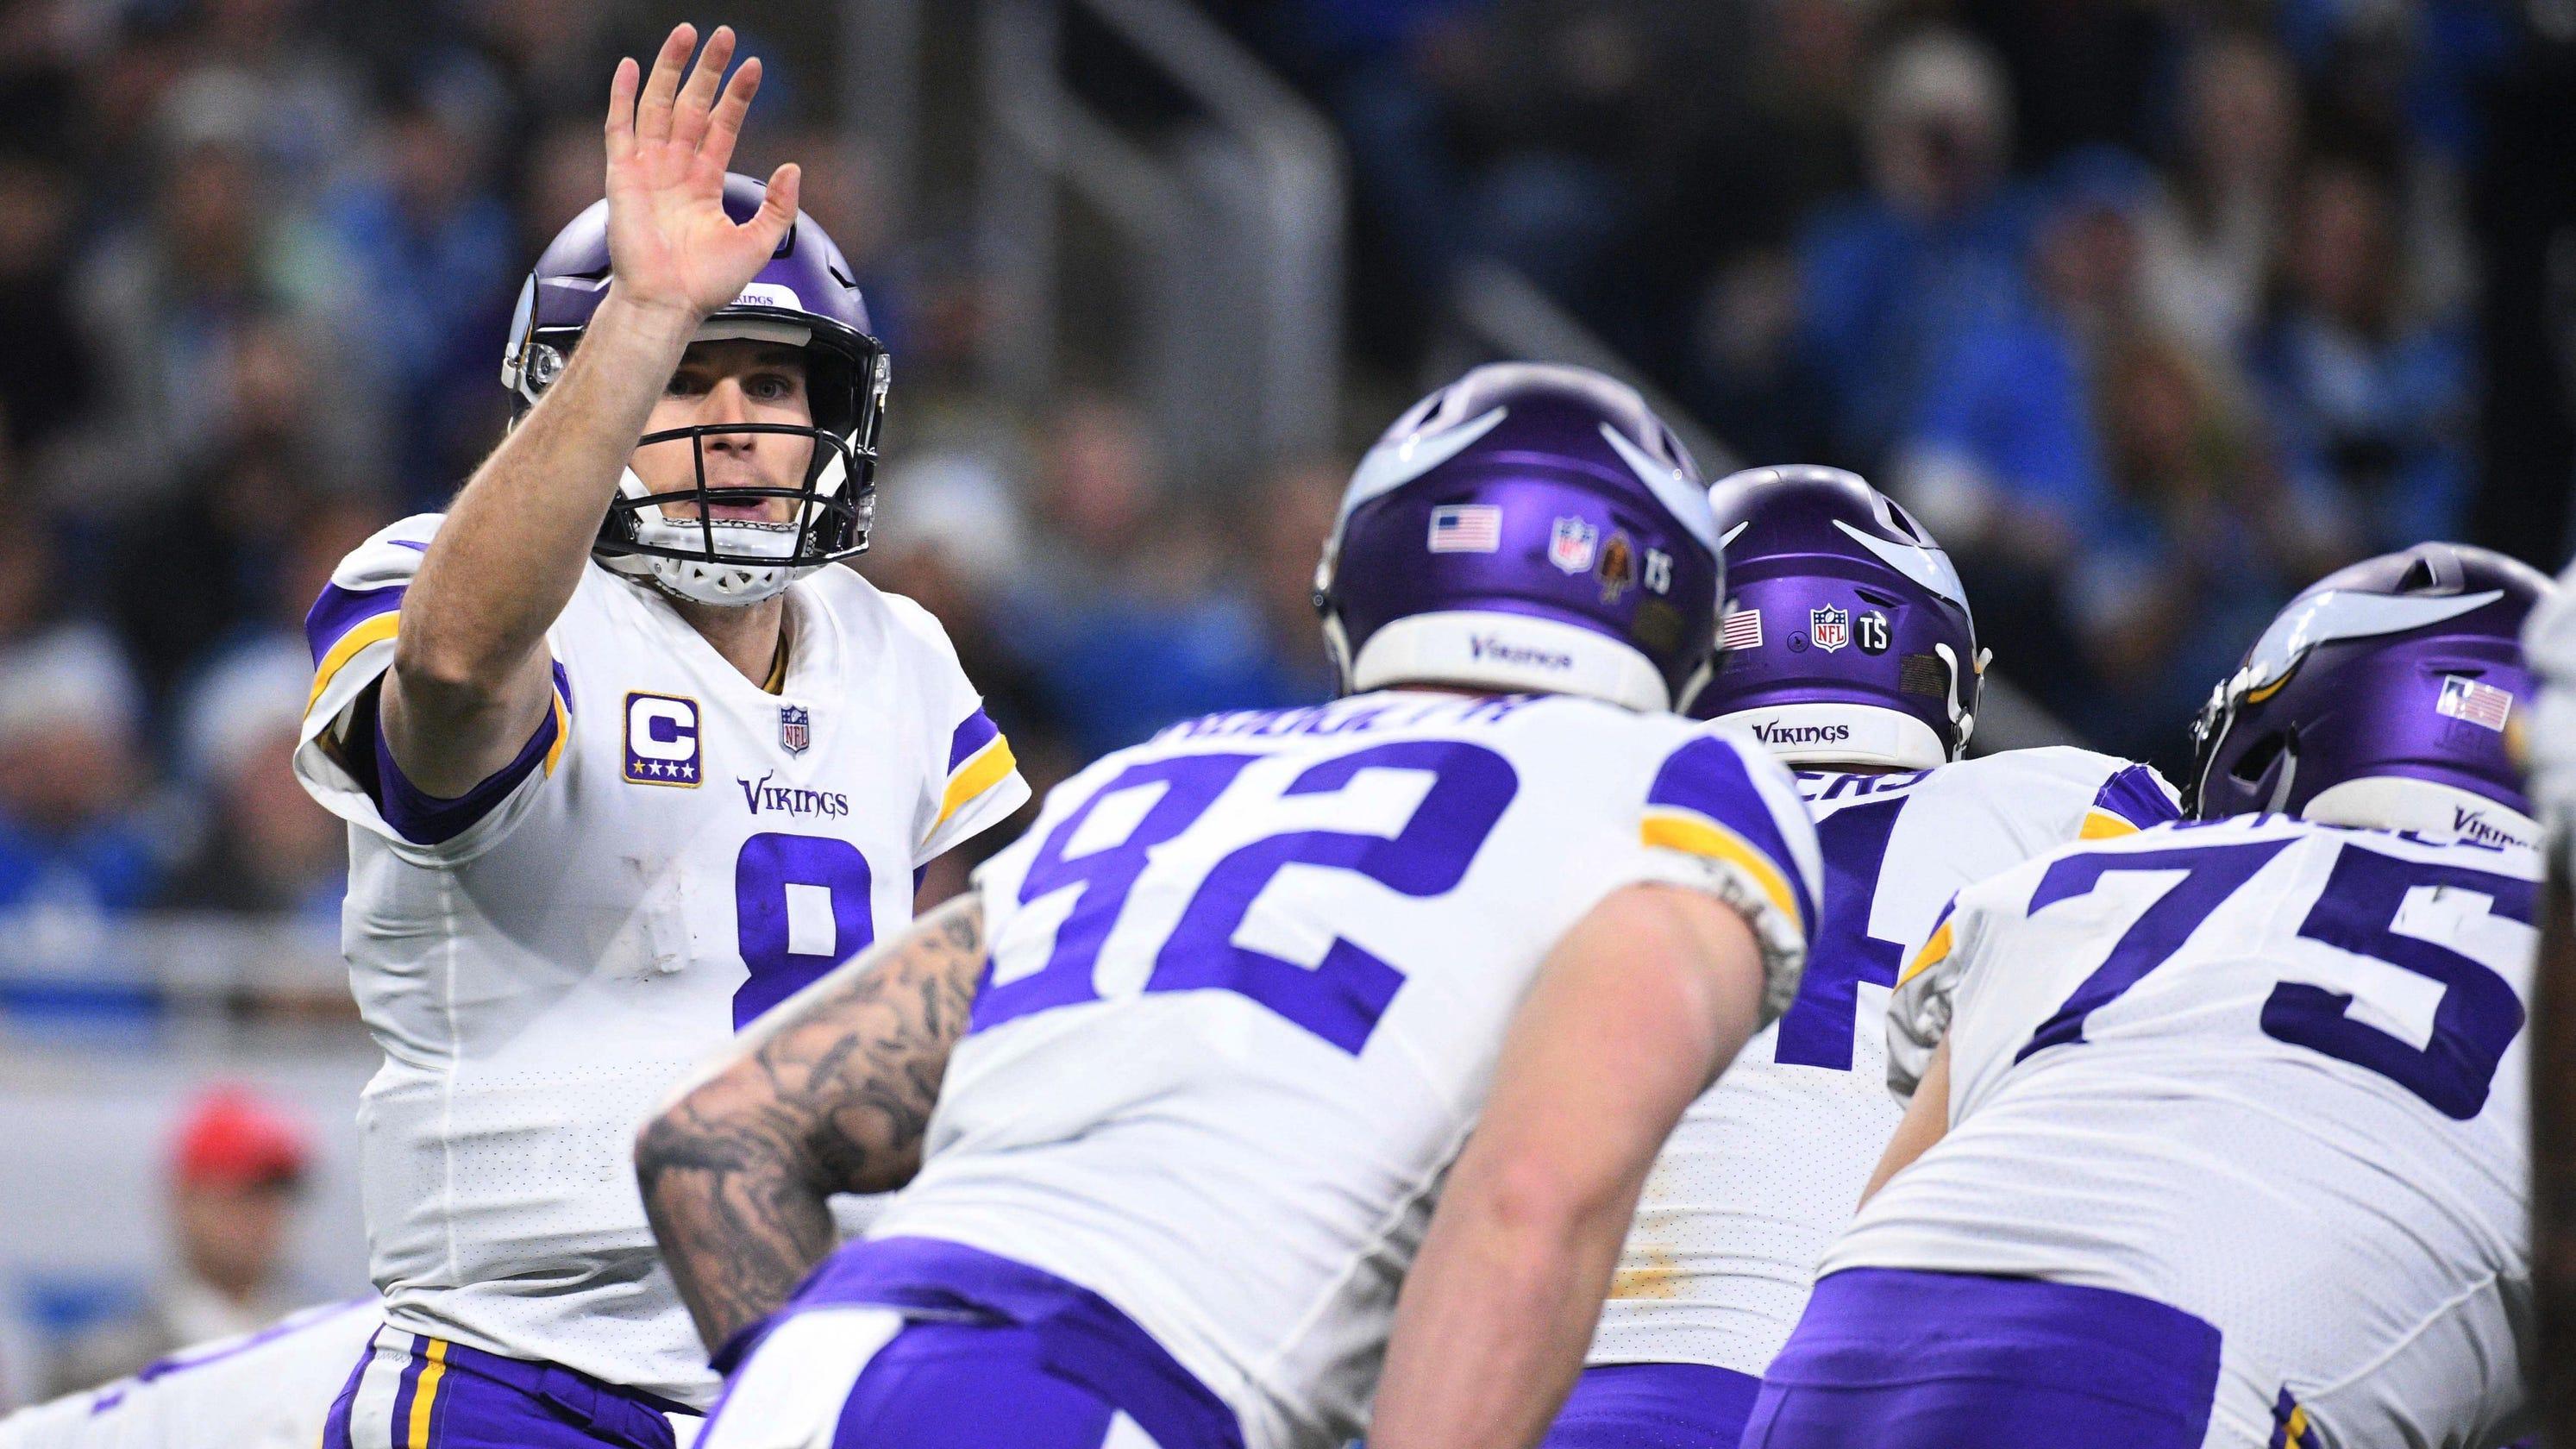 b06004d5 NFL Week 17 playoff clinching scenarios: AFC's top seed, three berths